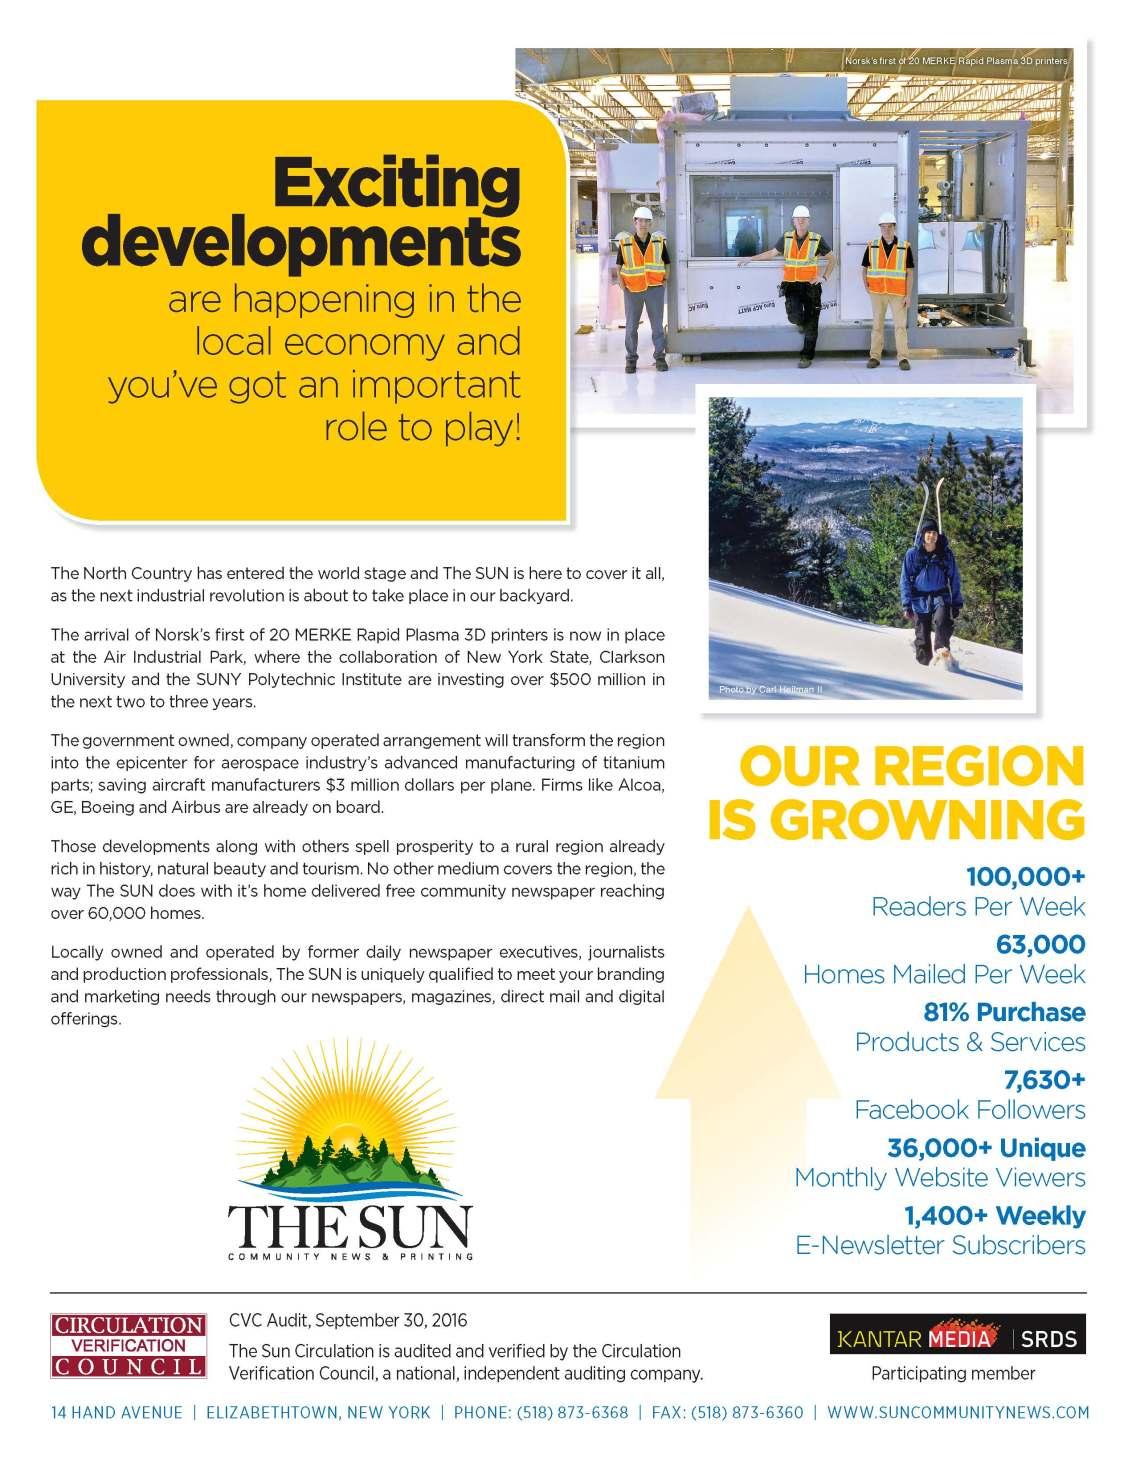 SunCommunityNews_SRDS_Flyer_8.5x11.indd